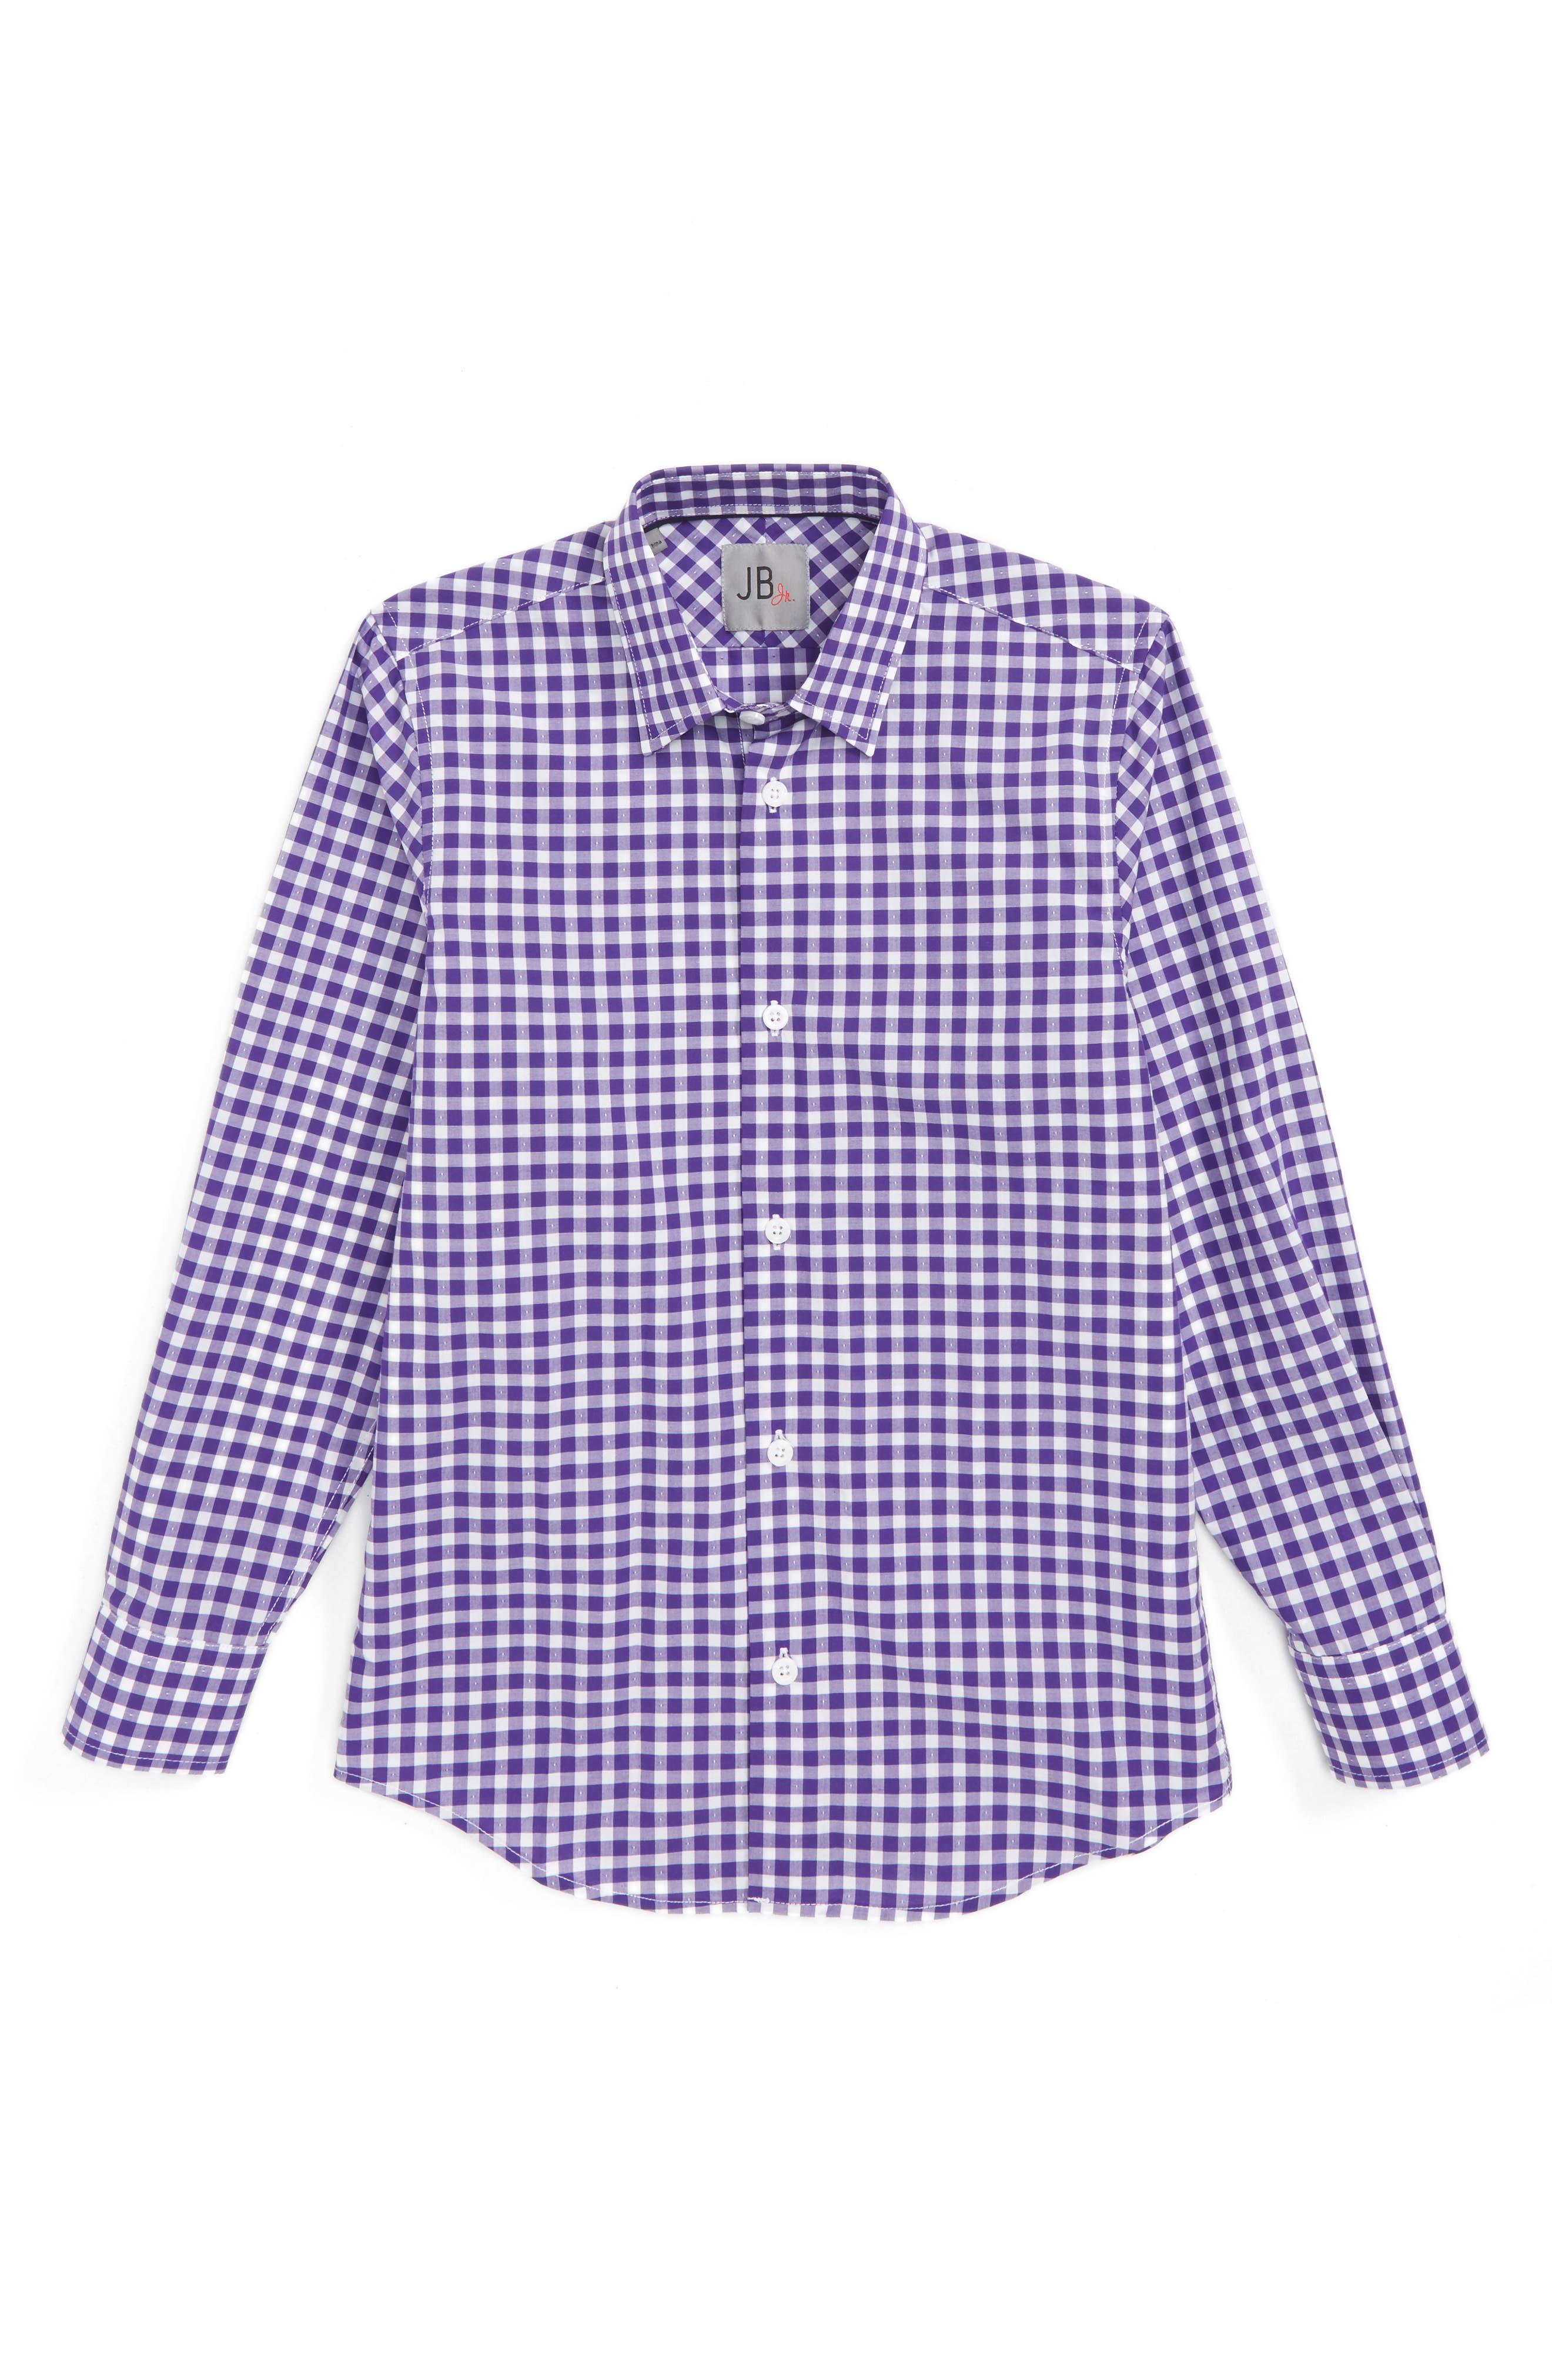 Main Image - JB Jr Check Dress Shirt (Big Boys)